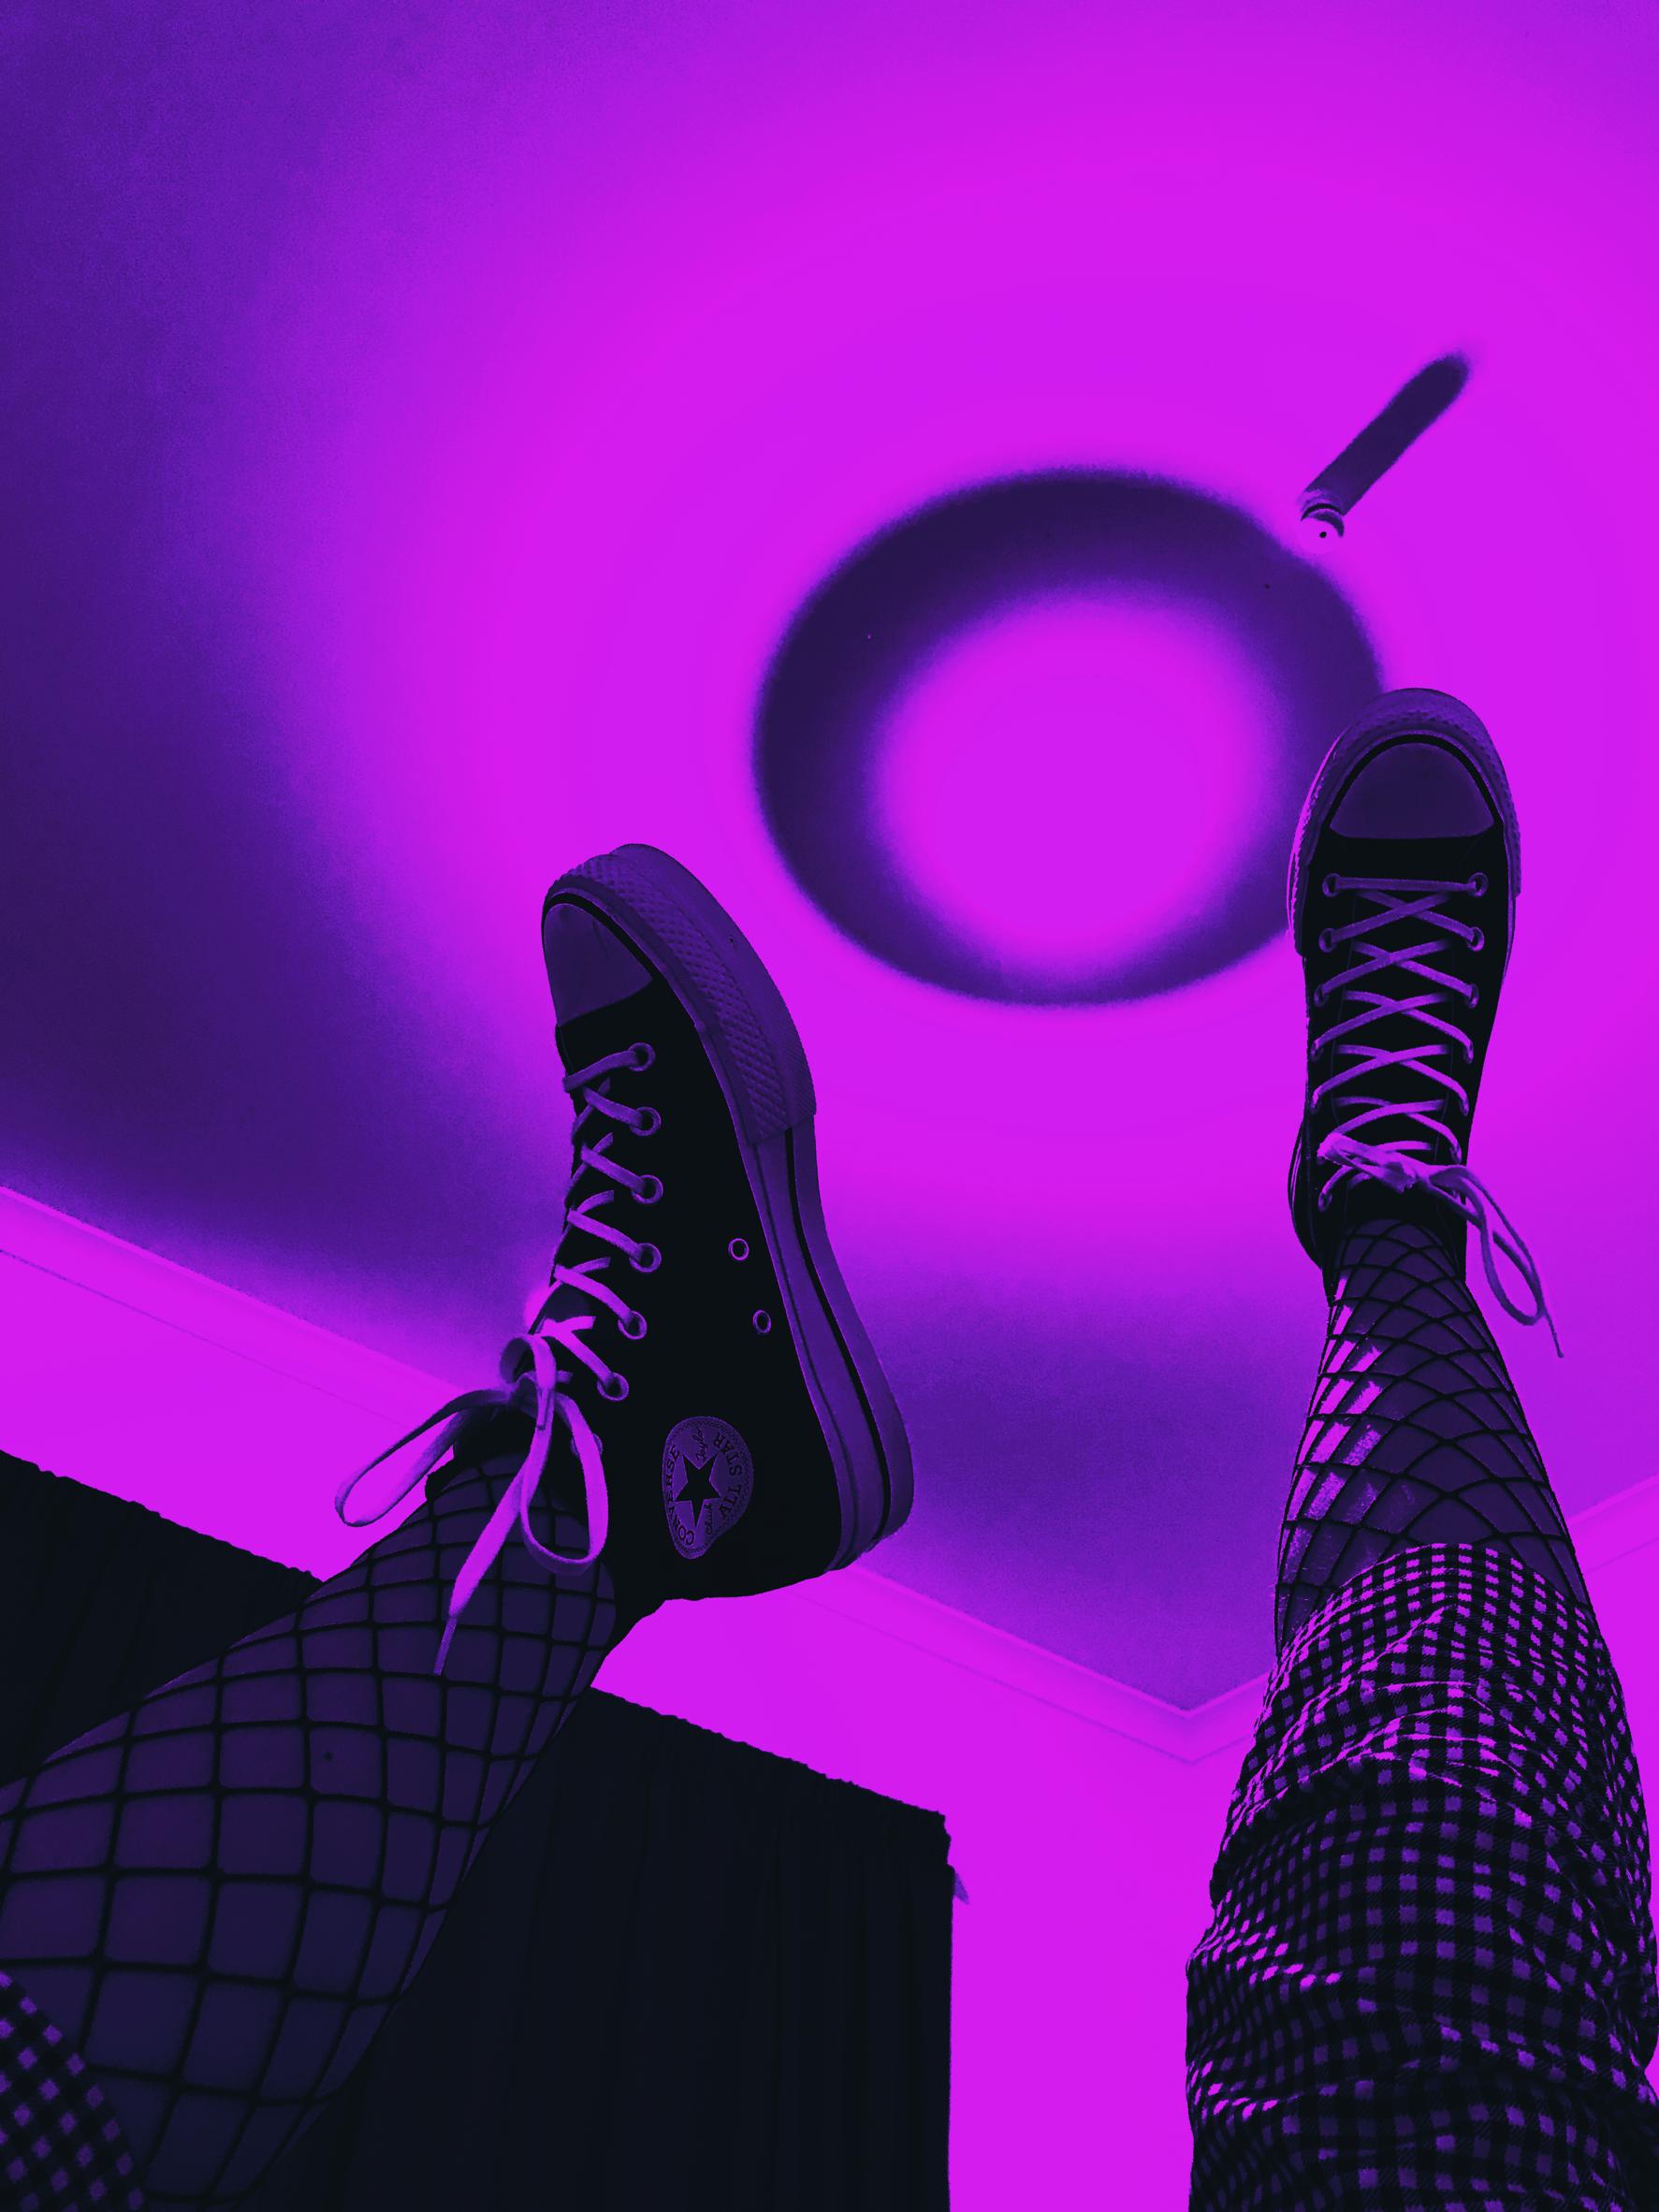 pin by mg on purple aesthetic purple aesthetic